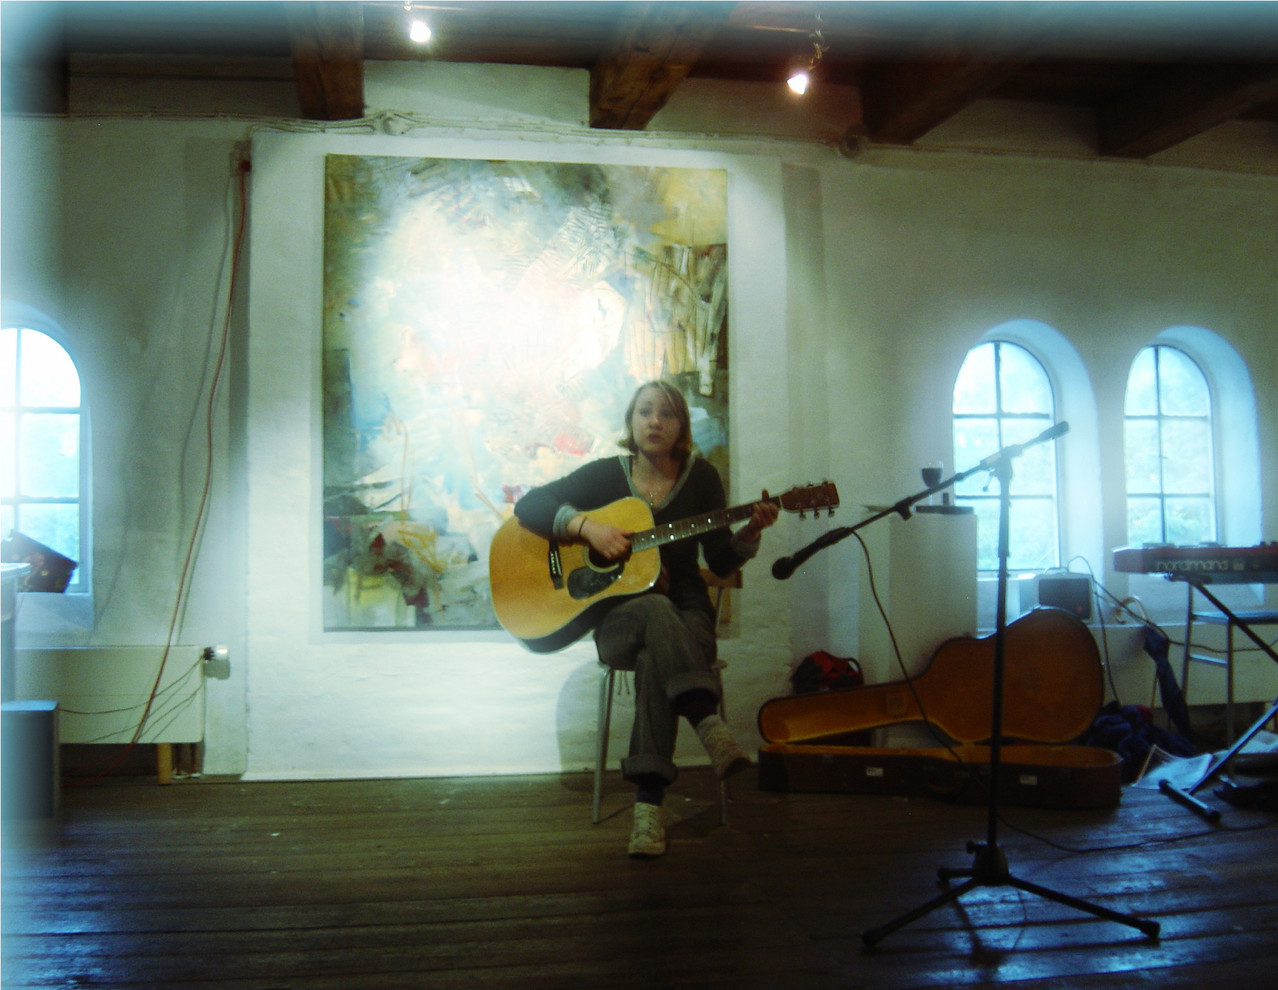 Anita Volk